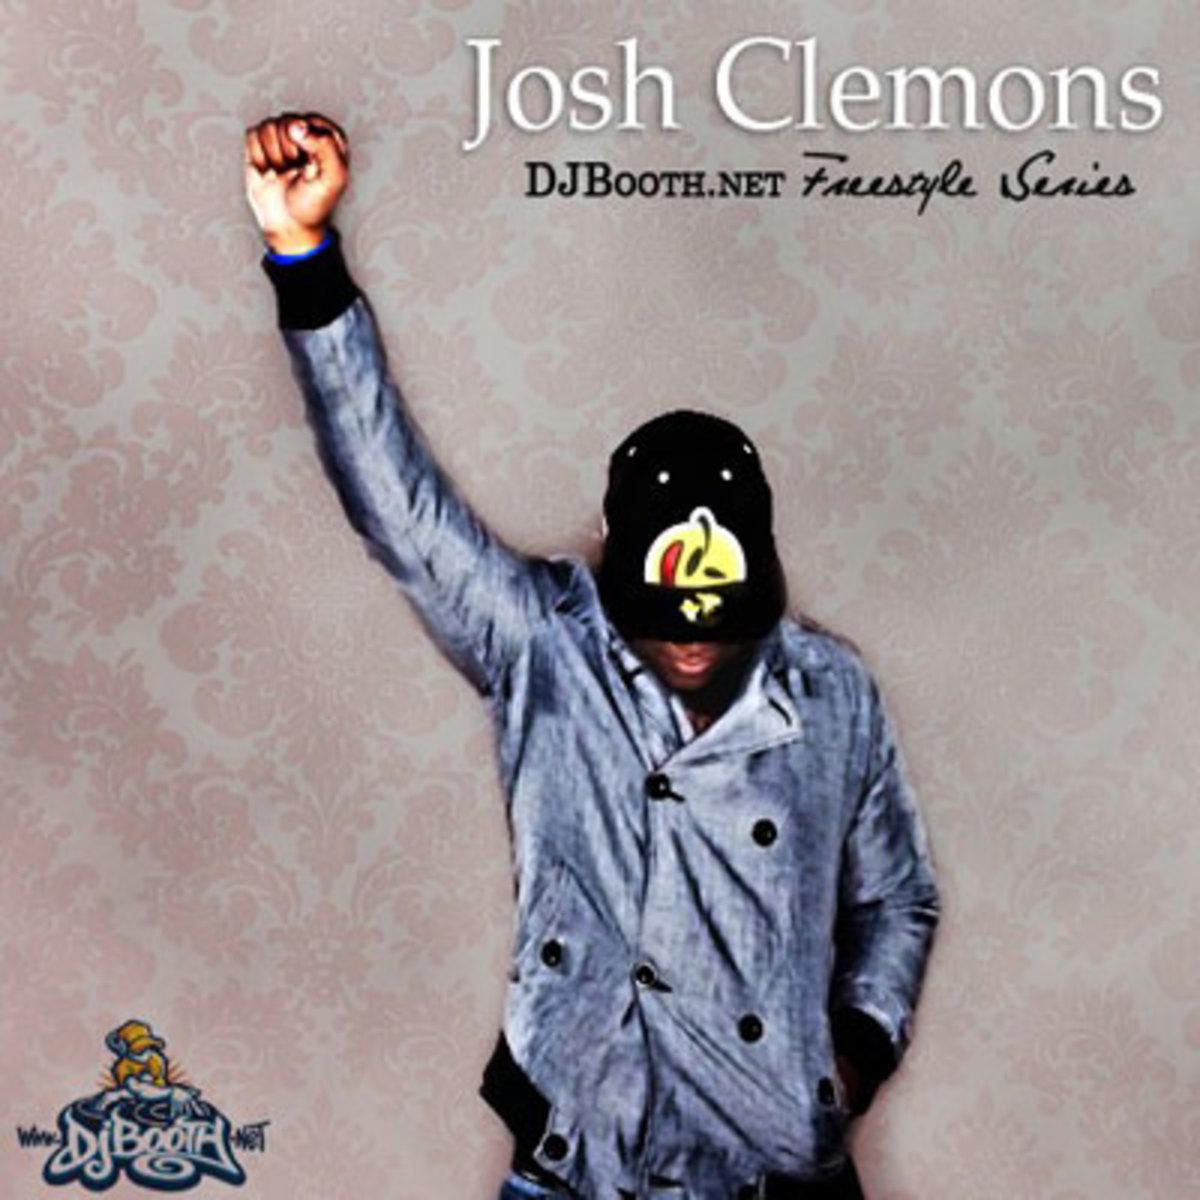 joshclemons-thisisjoshclemons.jpg